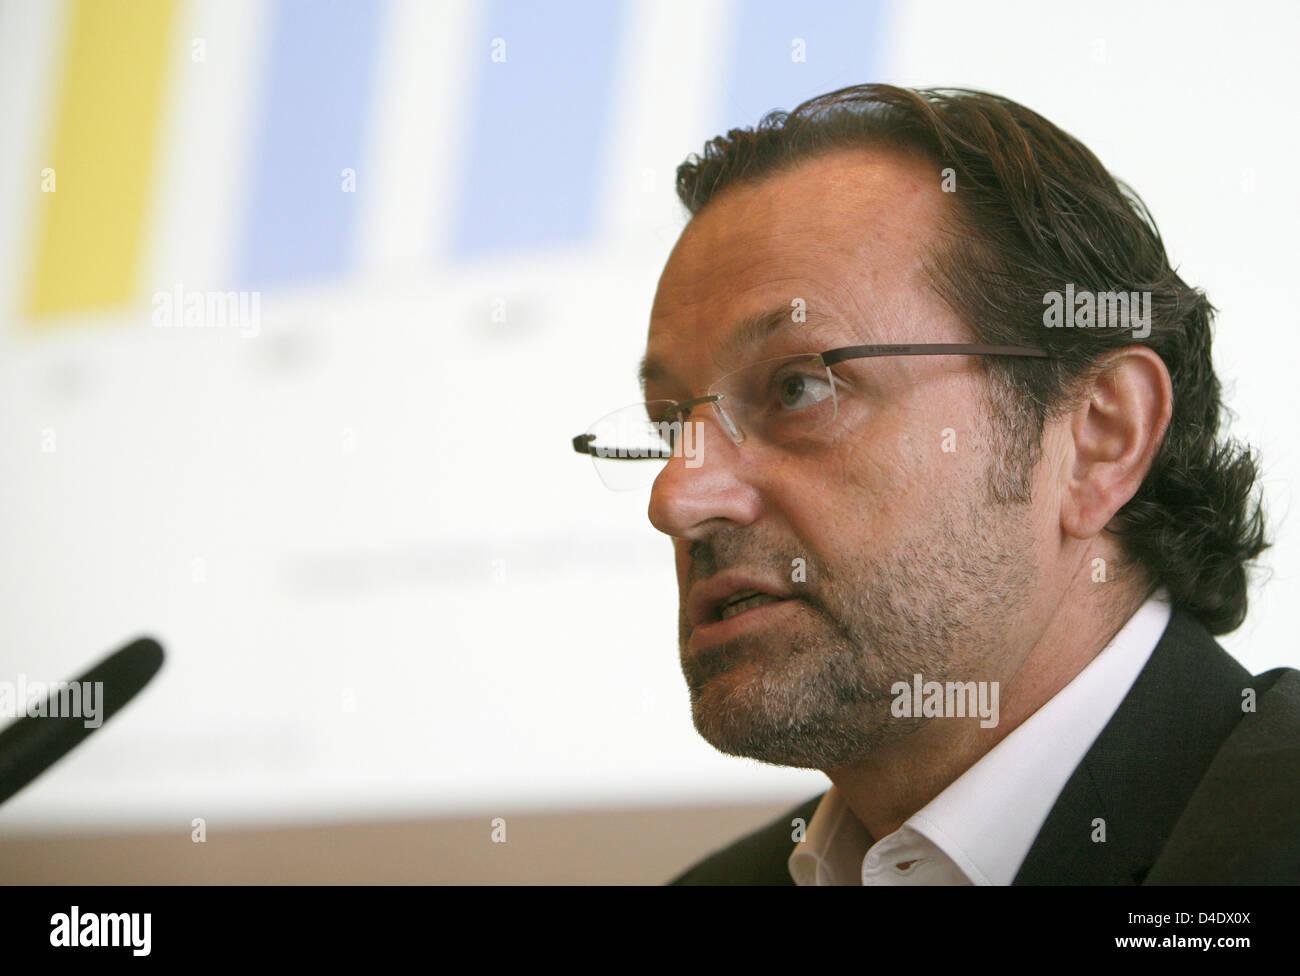 Richard J. Vogel, managing director of TUI Cruises Ltd., speaks at a press conference in Hamburg, Germany, 29 April - Stock Image